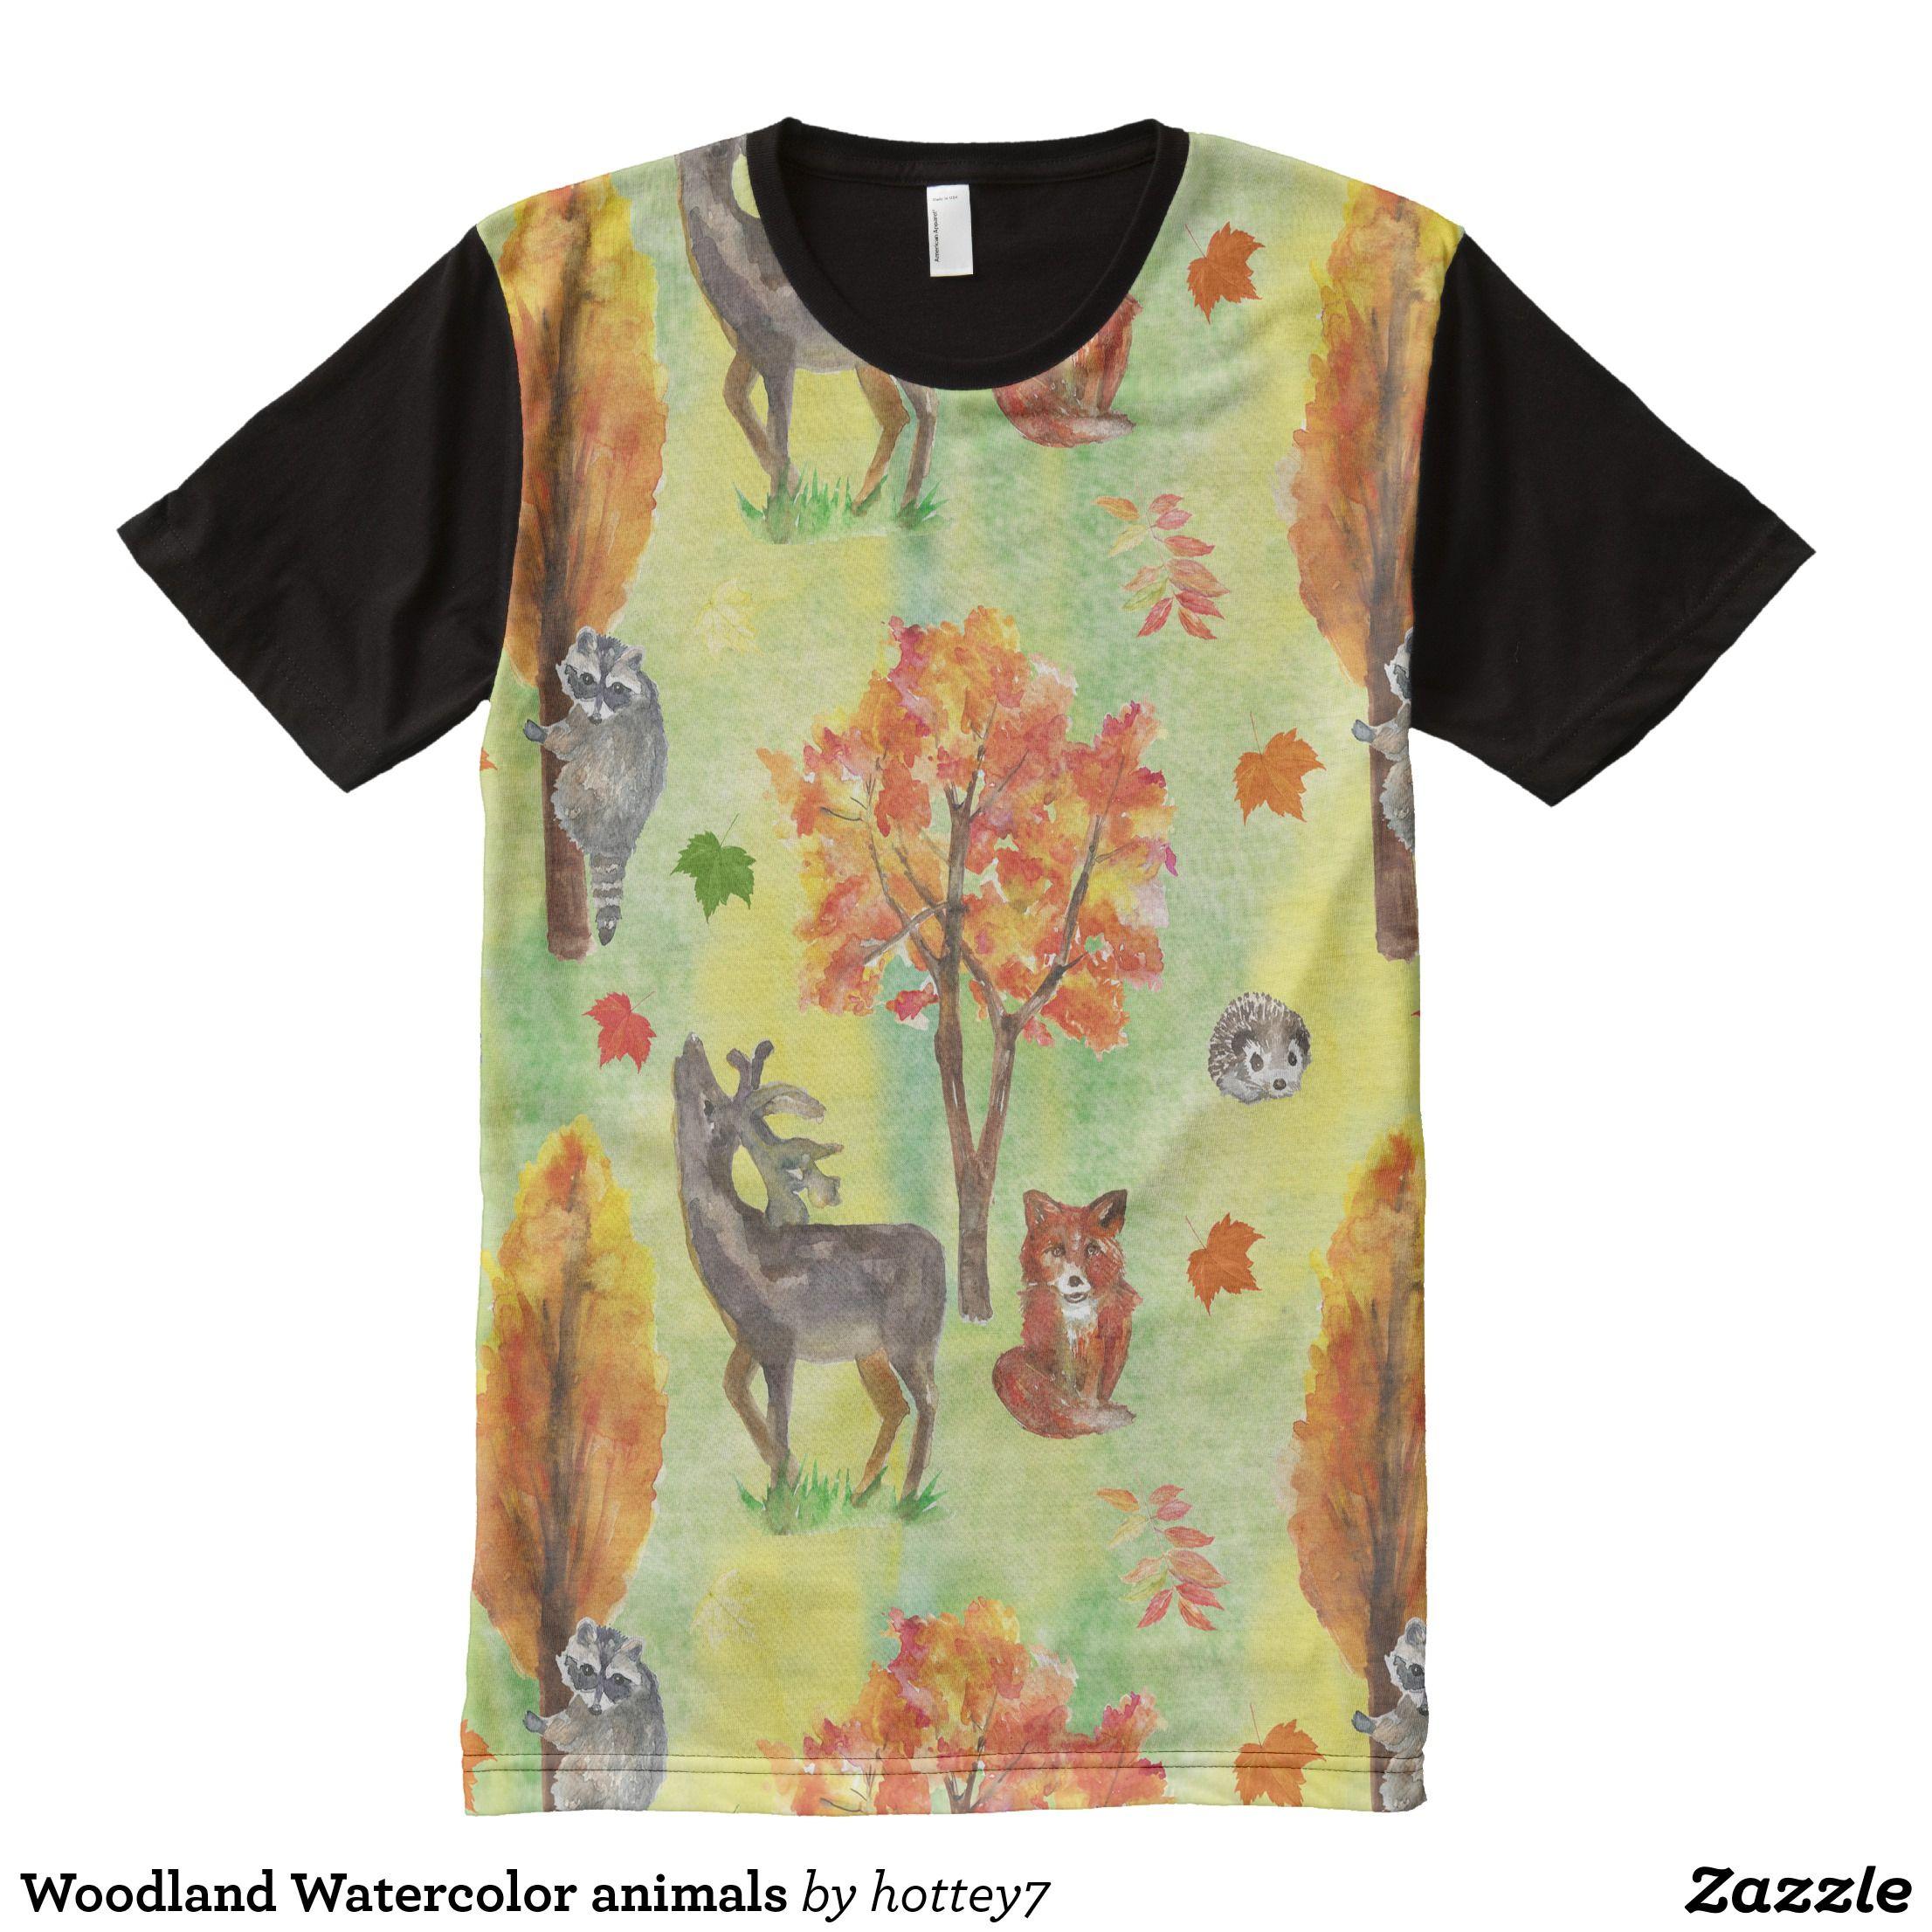 Woodland Watercolor Animals All Over Print Shirt Visually